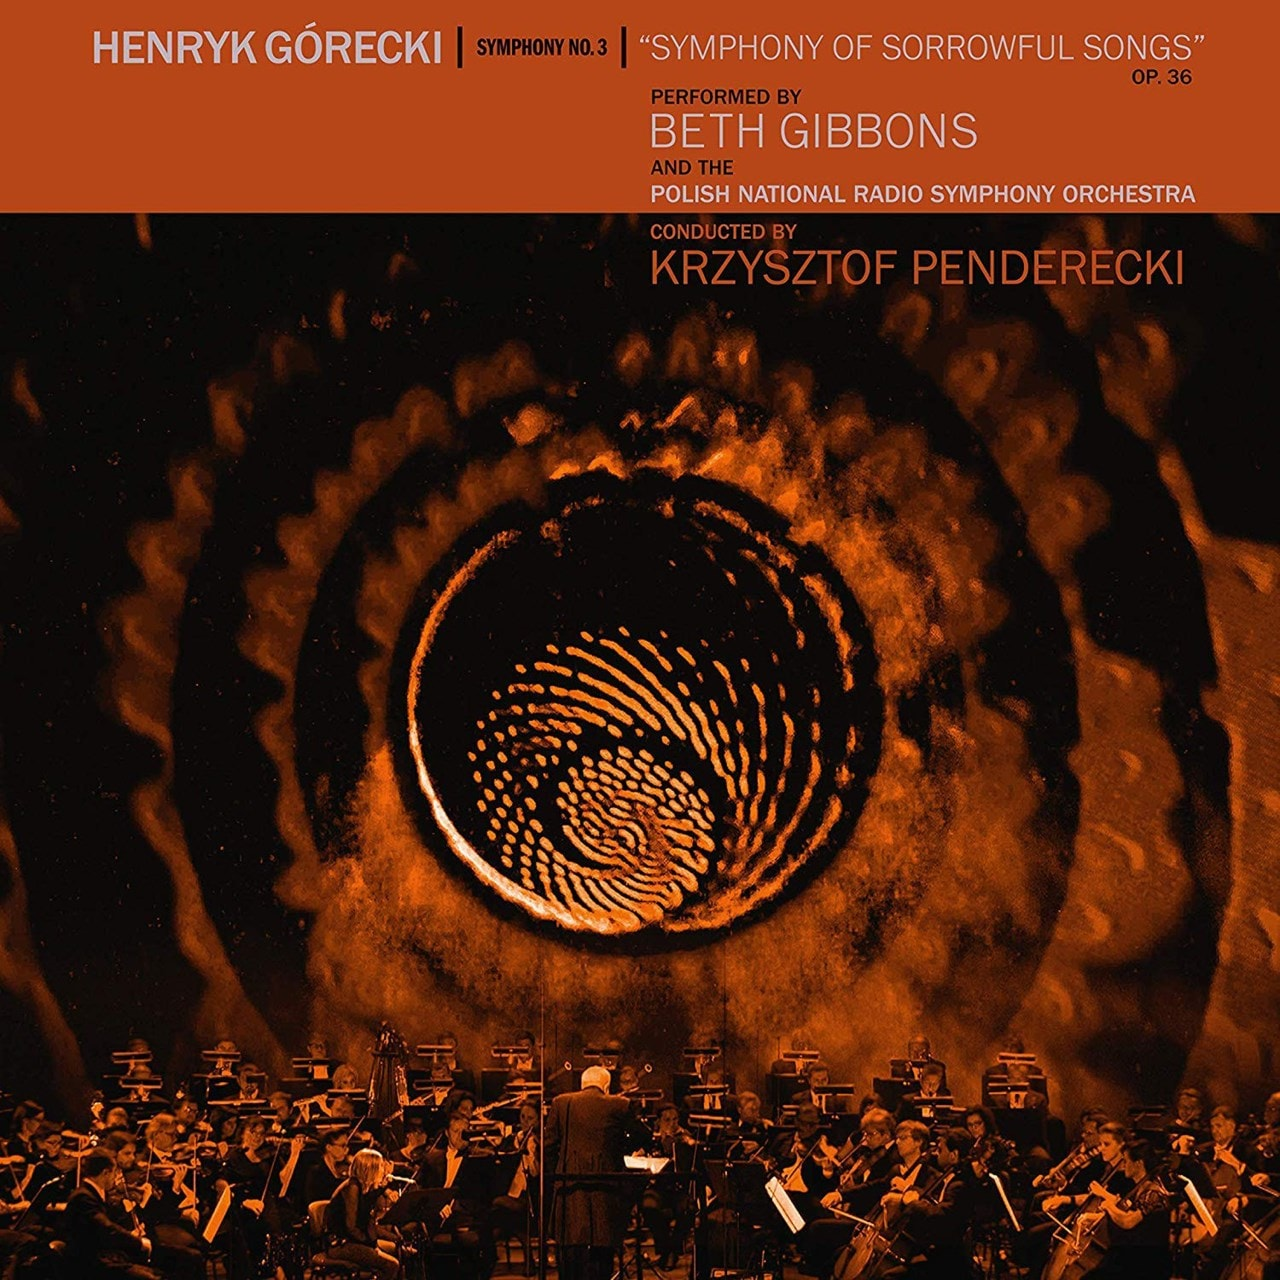 Symphony No. 3 (Symphony of Sorrowful Songs) - 1